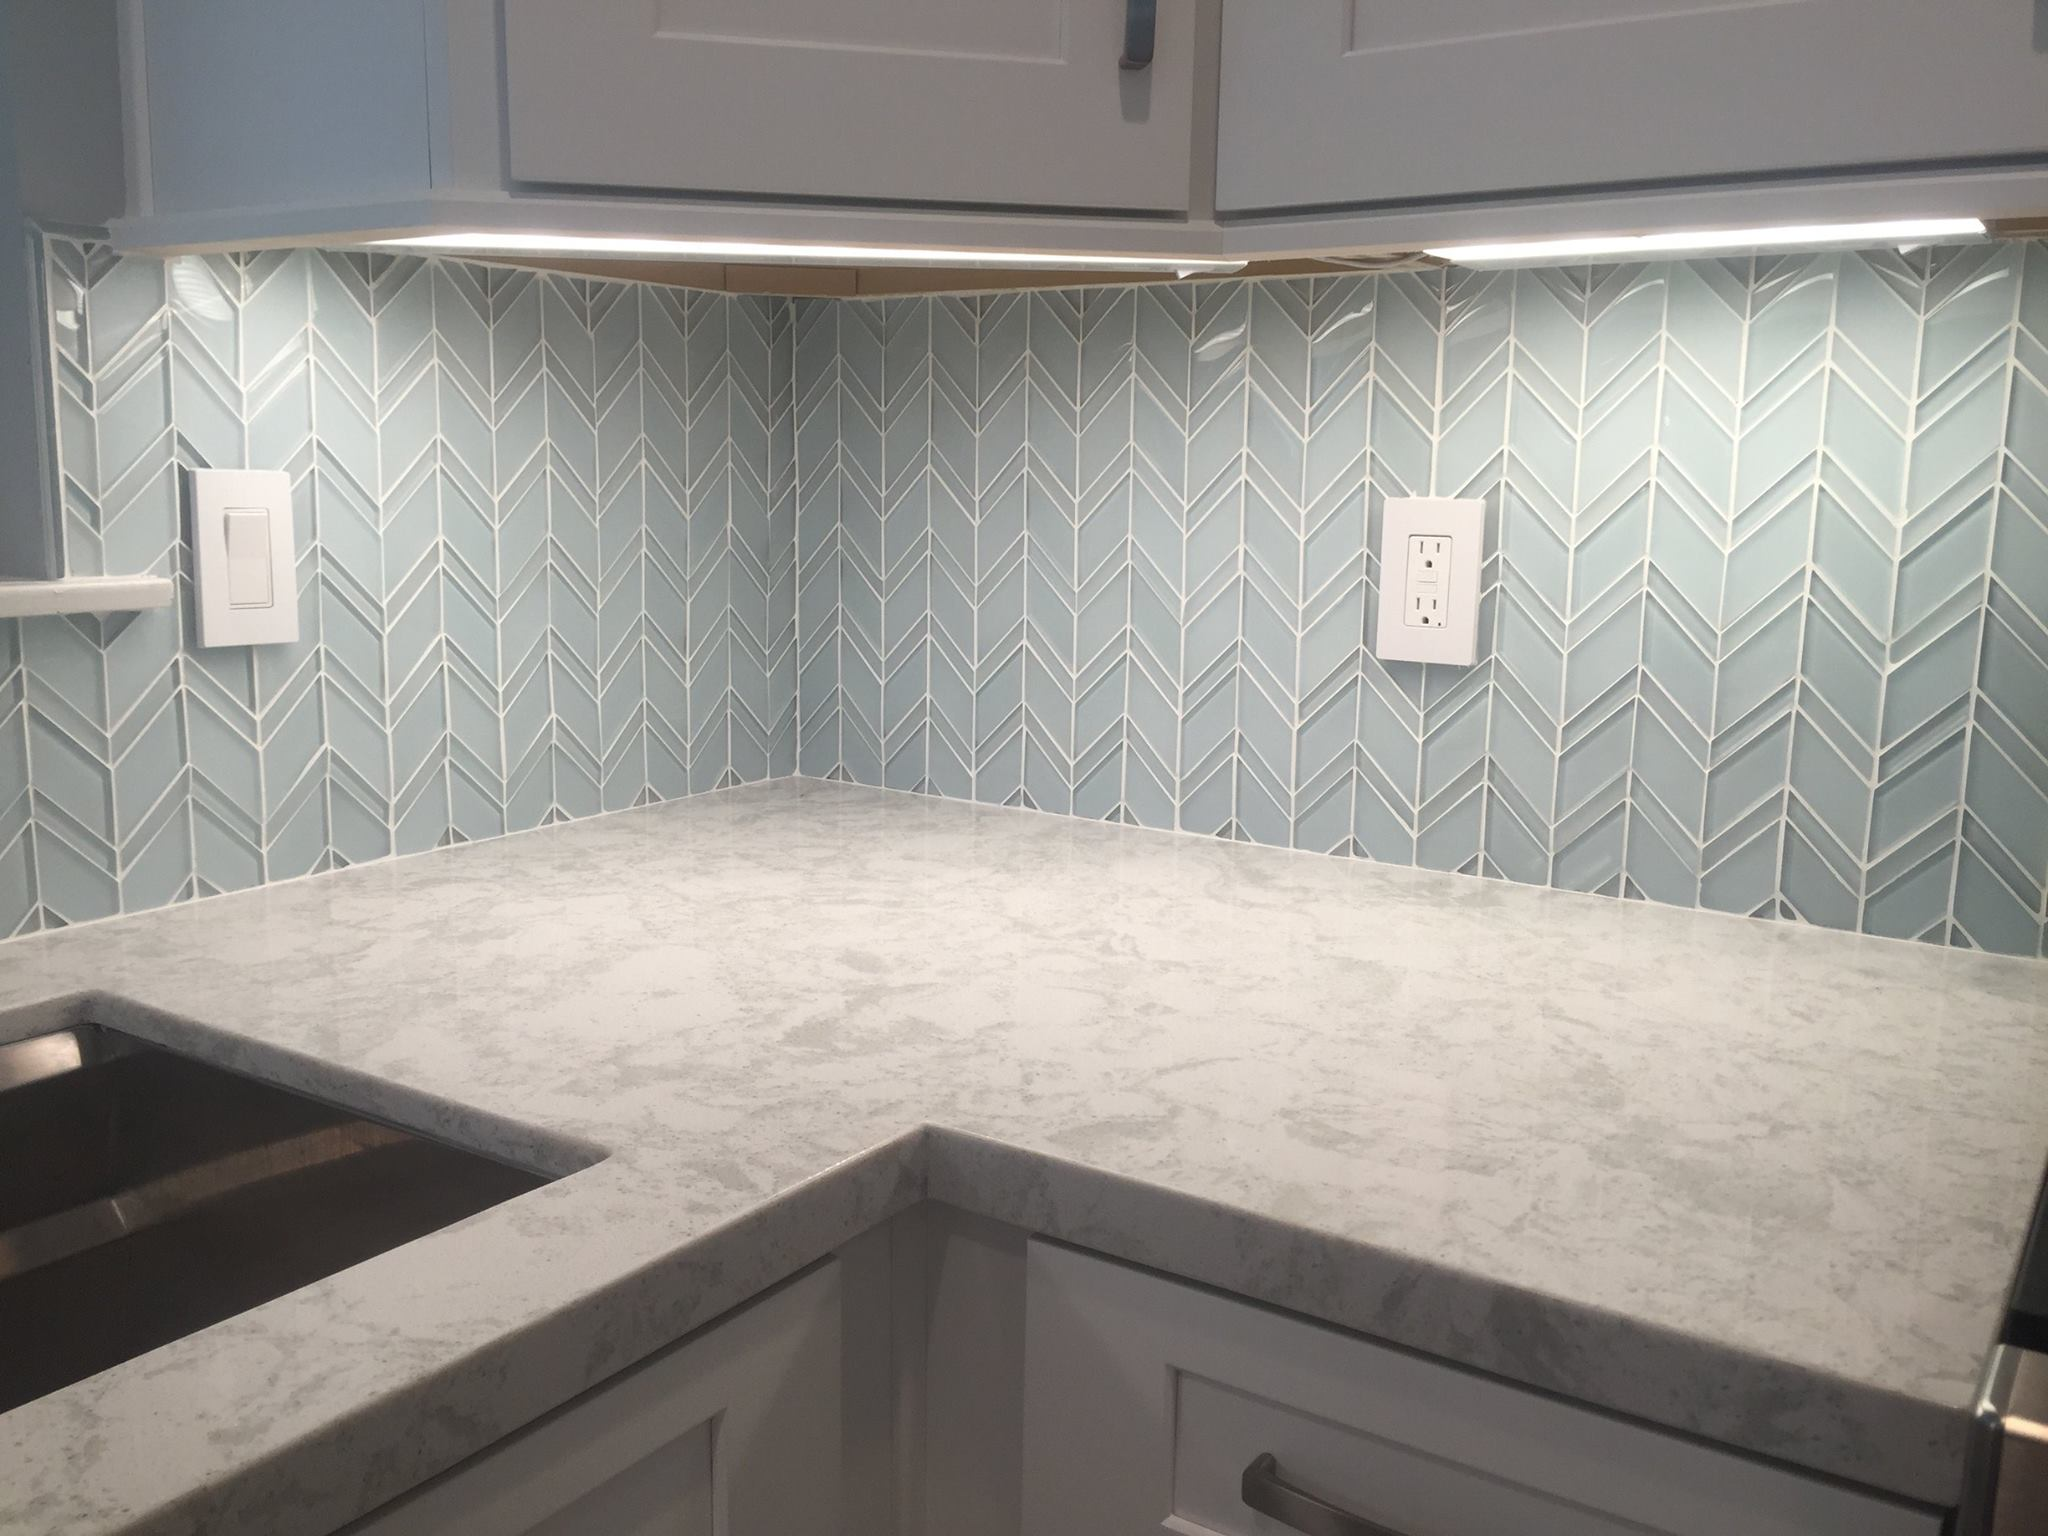 Subway Tile Patterns Kitchen